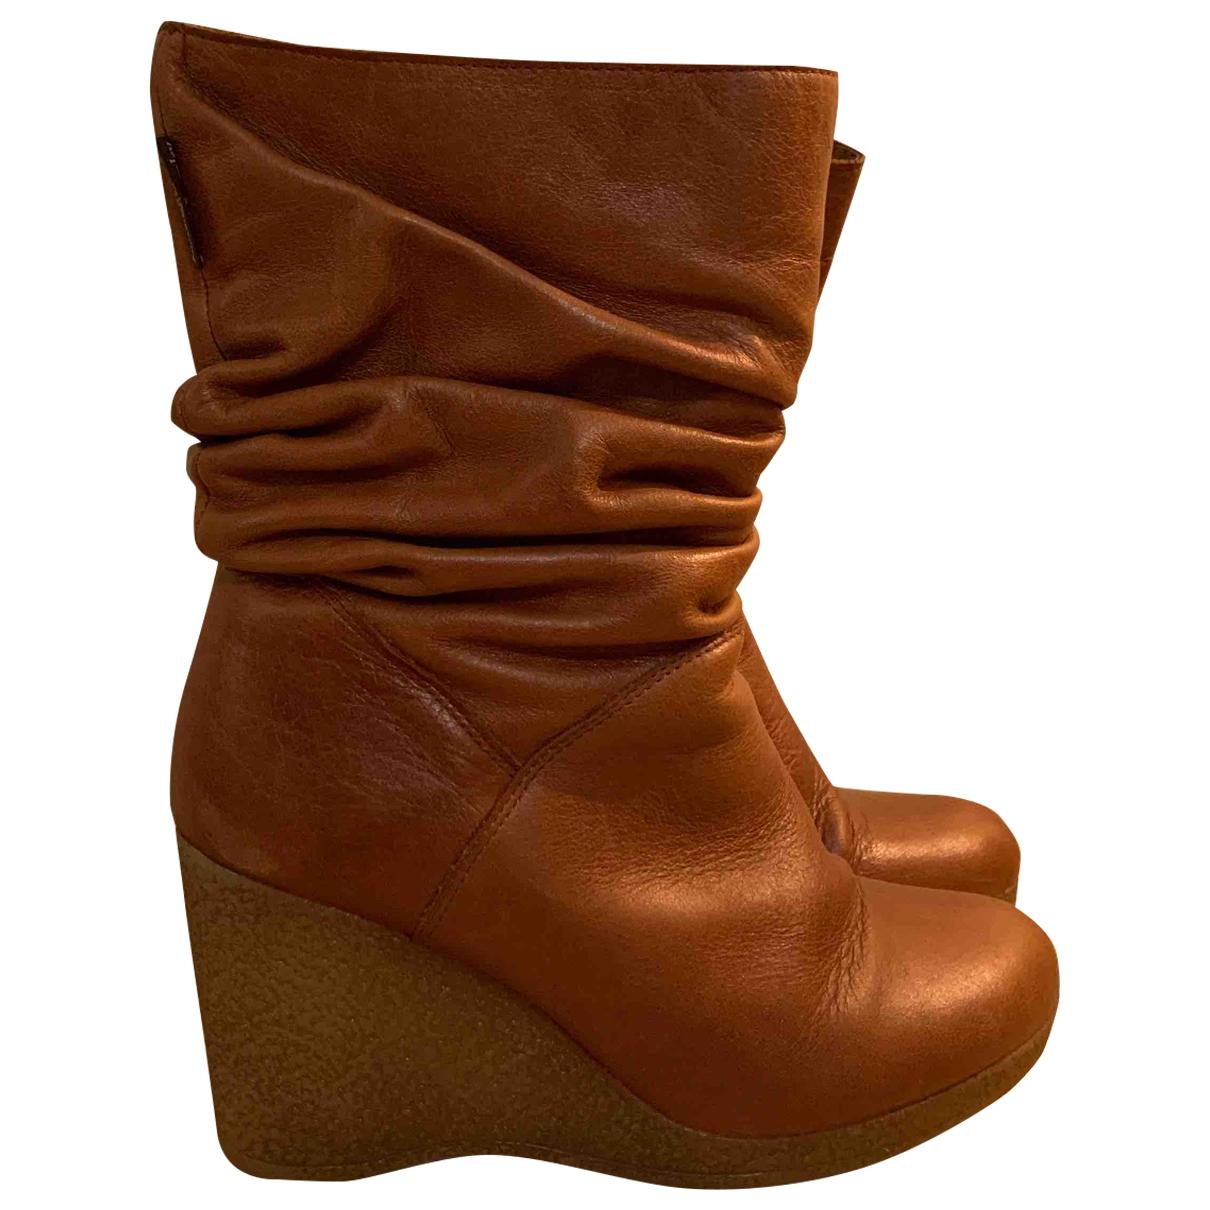 Russell & Bromley - Bottes   pour femme en cuir - camel